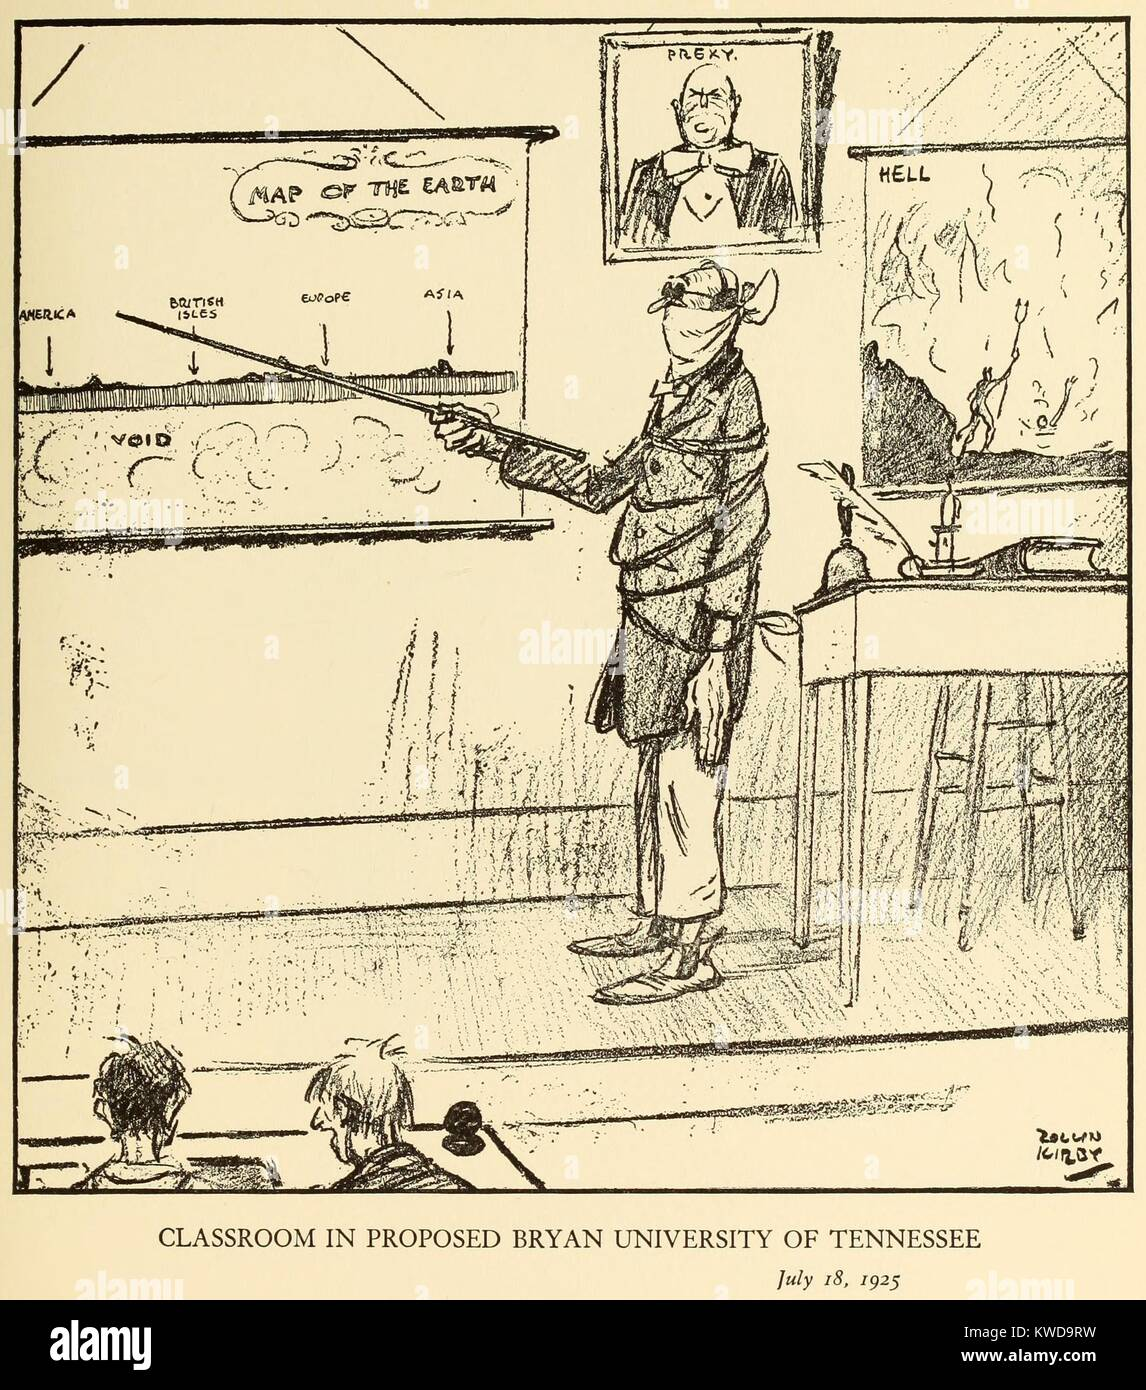 Universität radford datiert